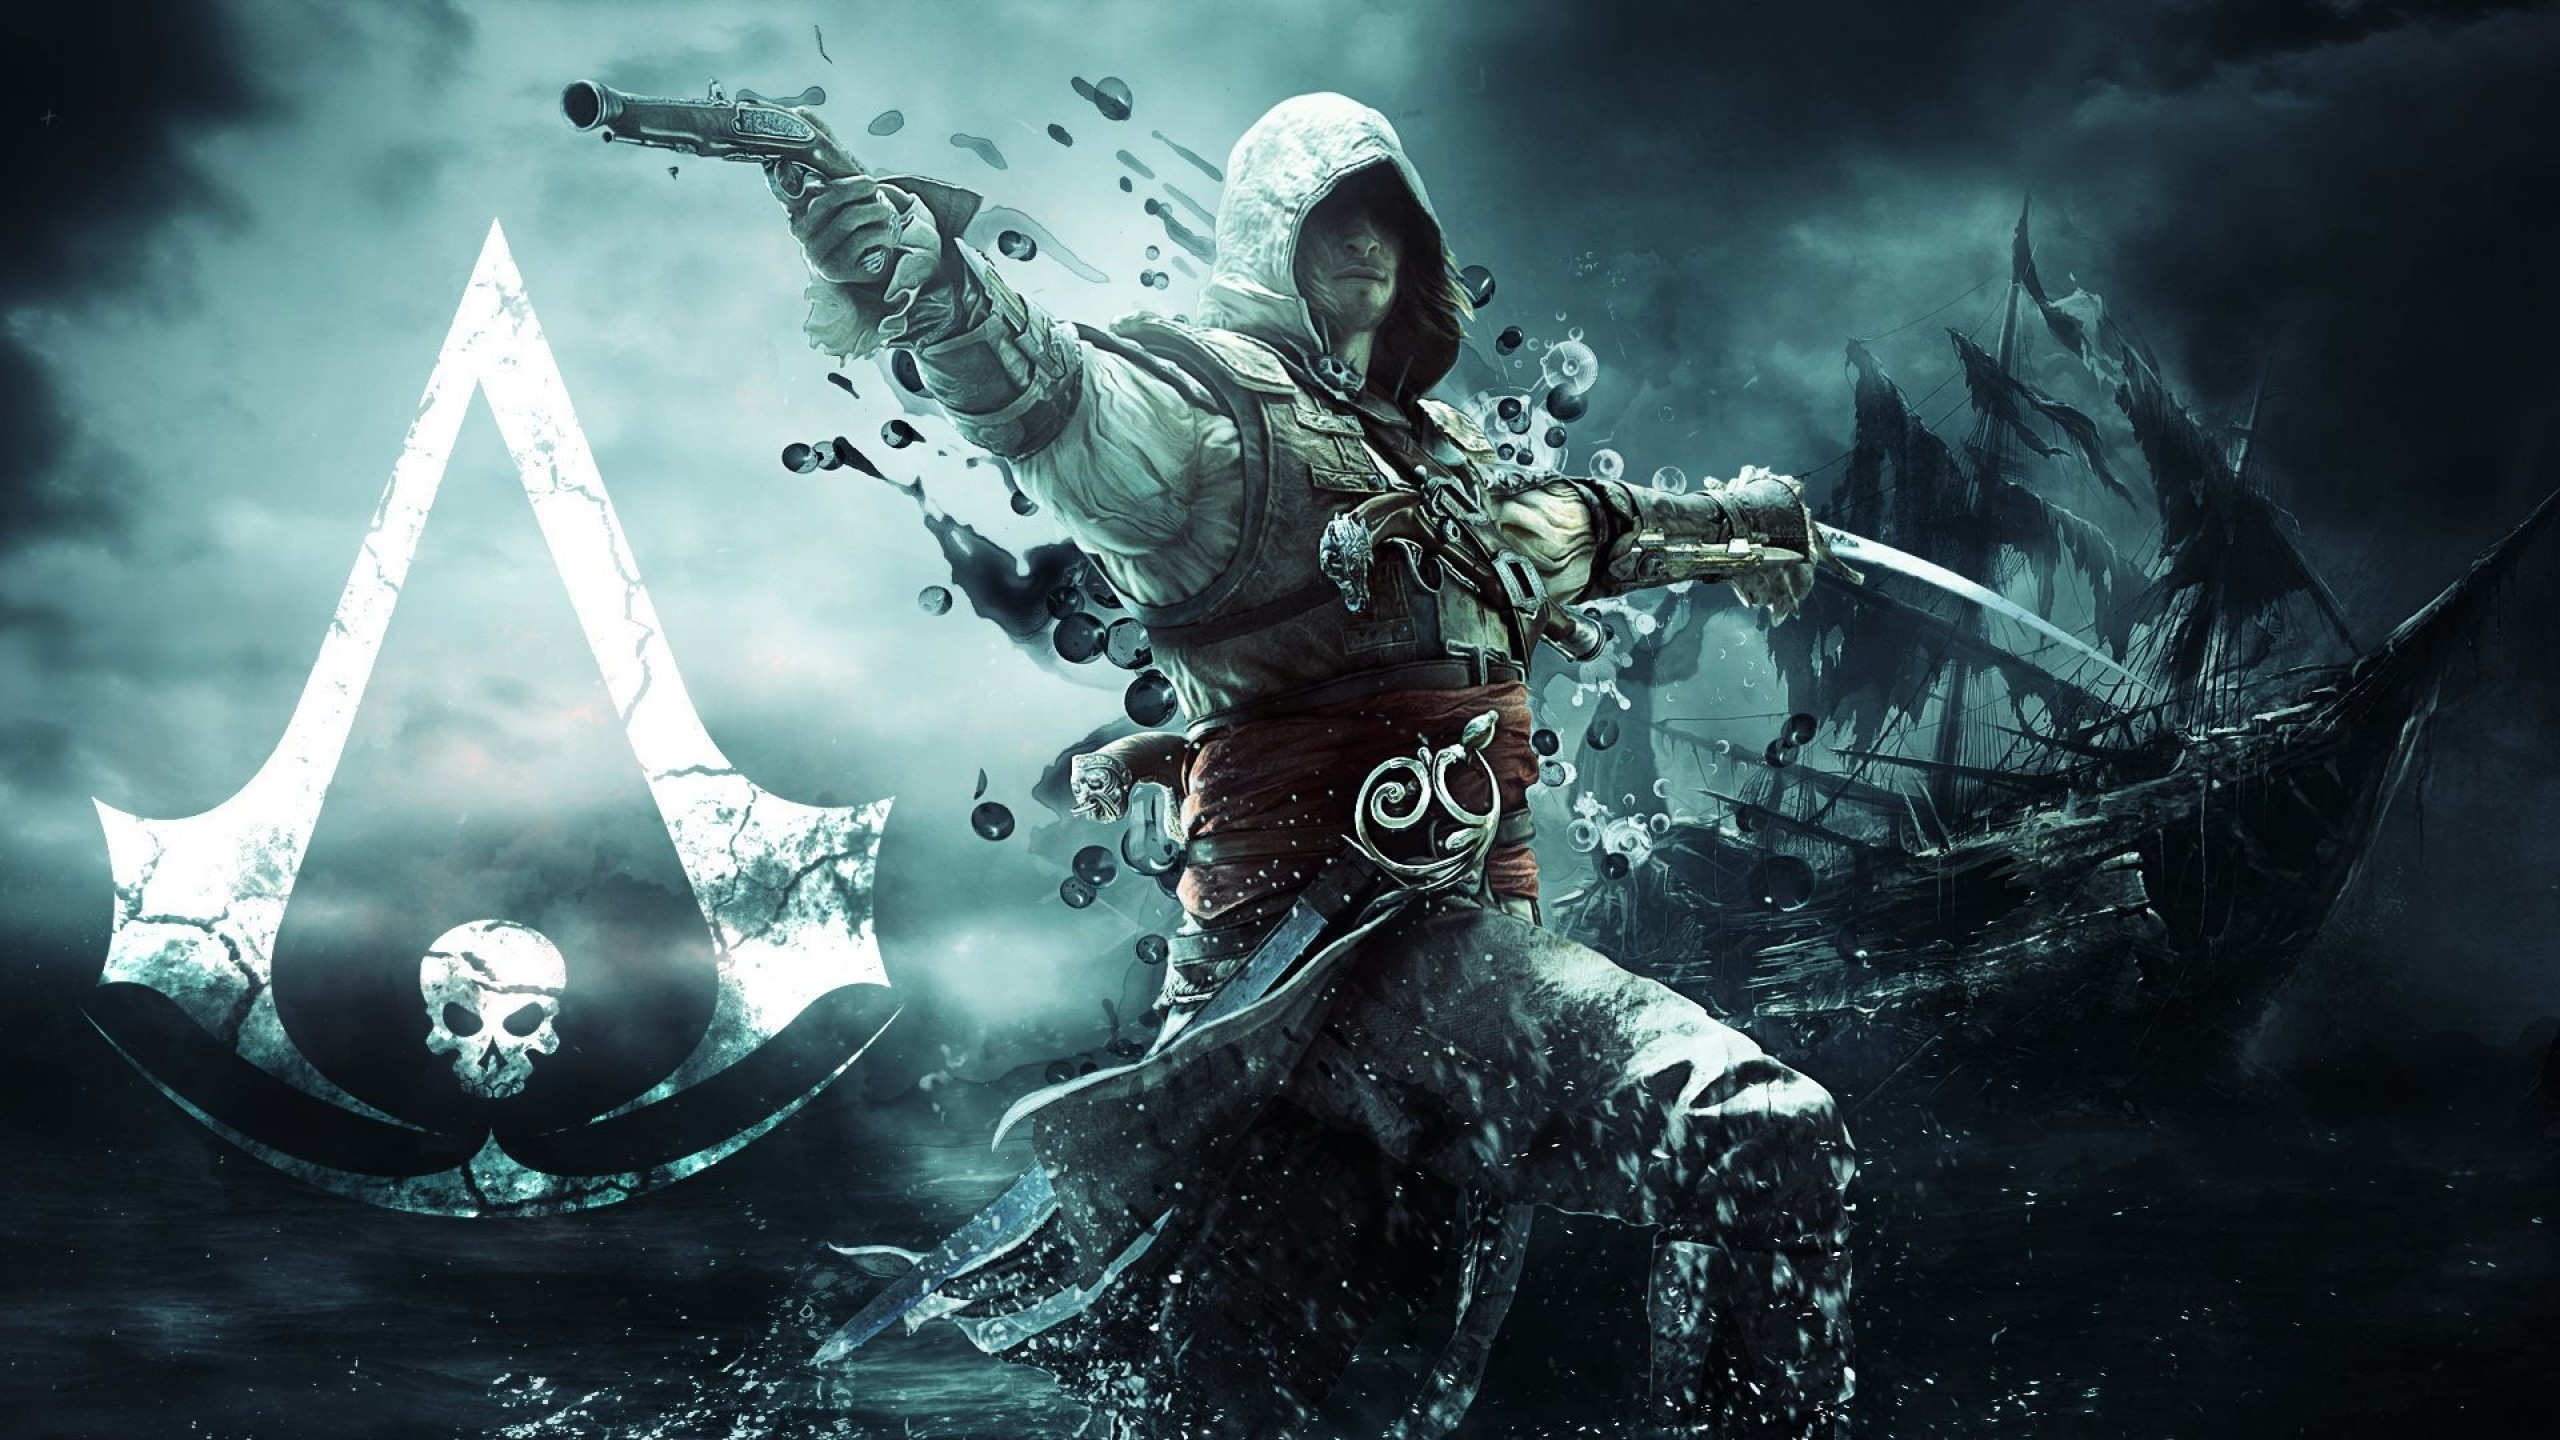 Wallpaper assassin, pirate, edward kenuey, gun, sword, flag, ship